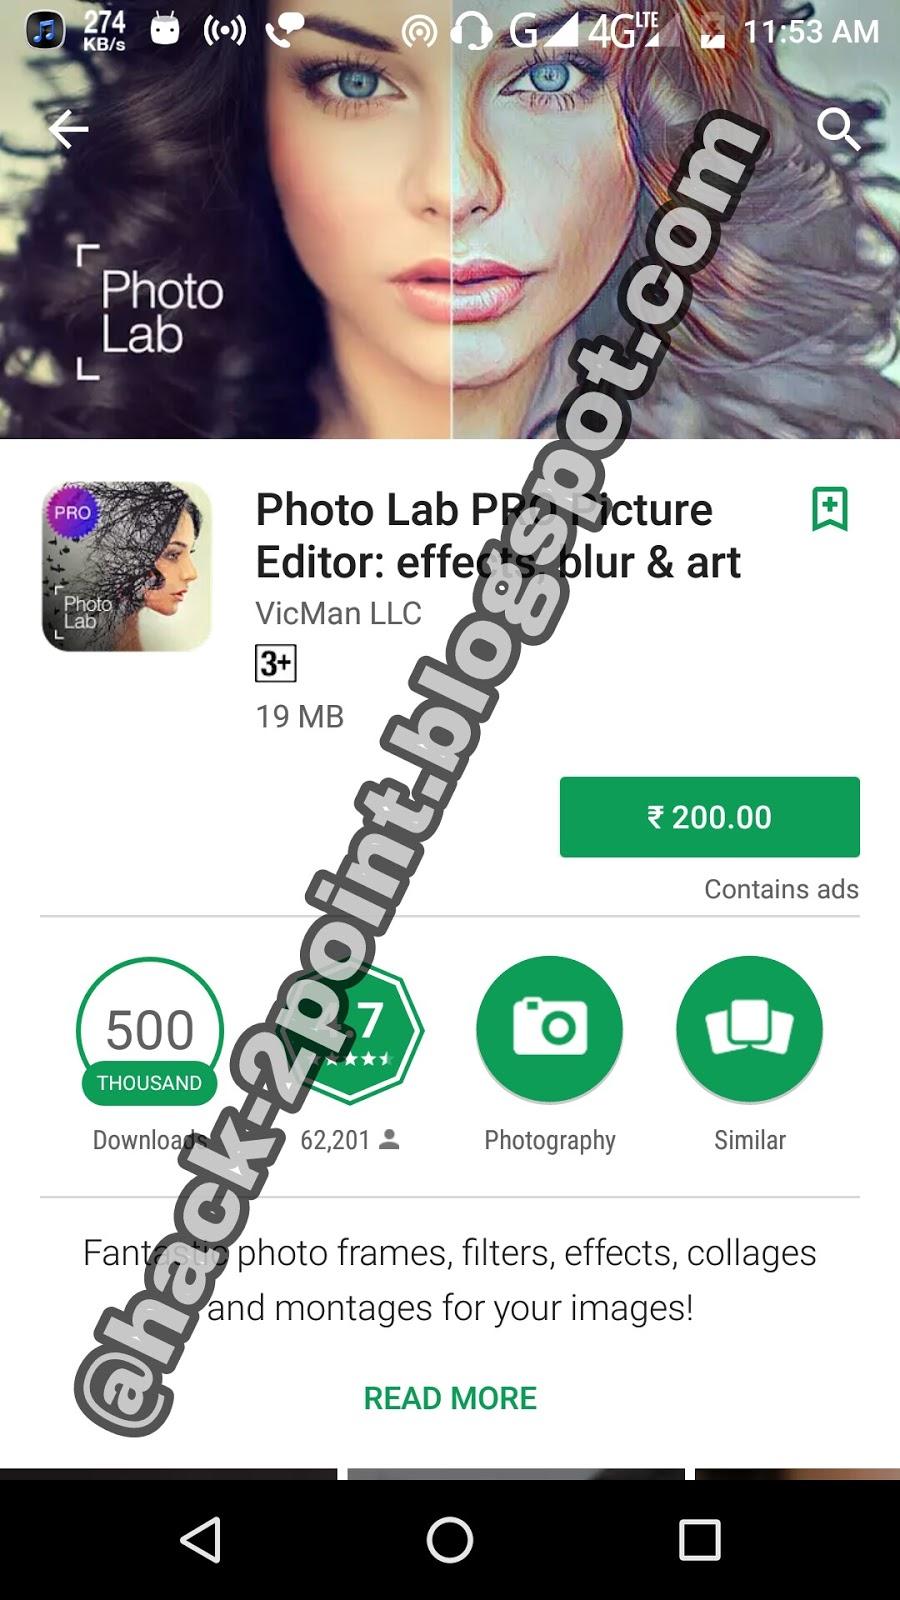 photo lab pro photo editor free download